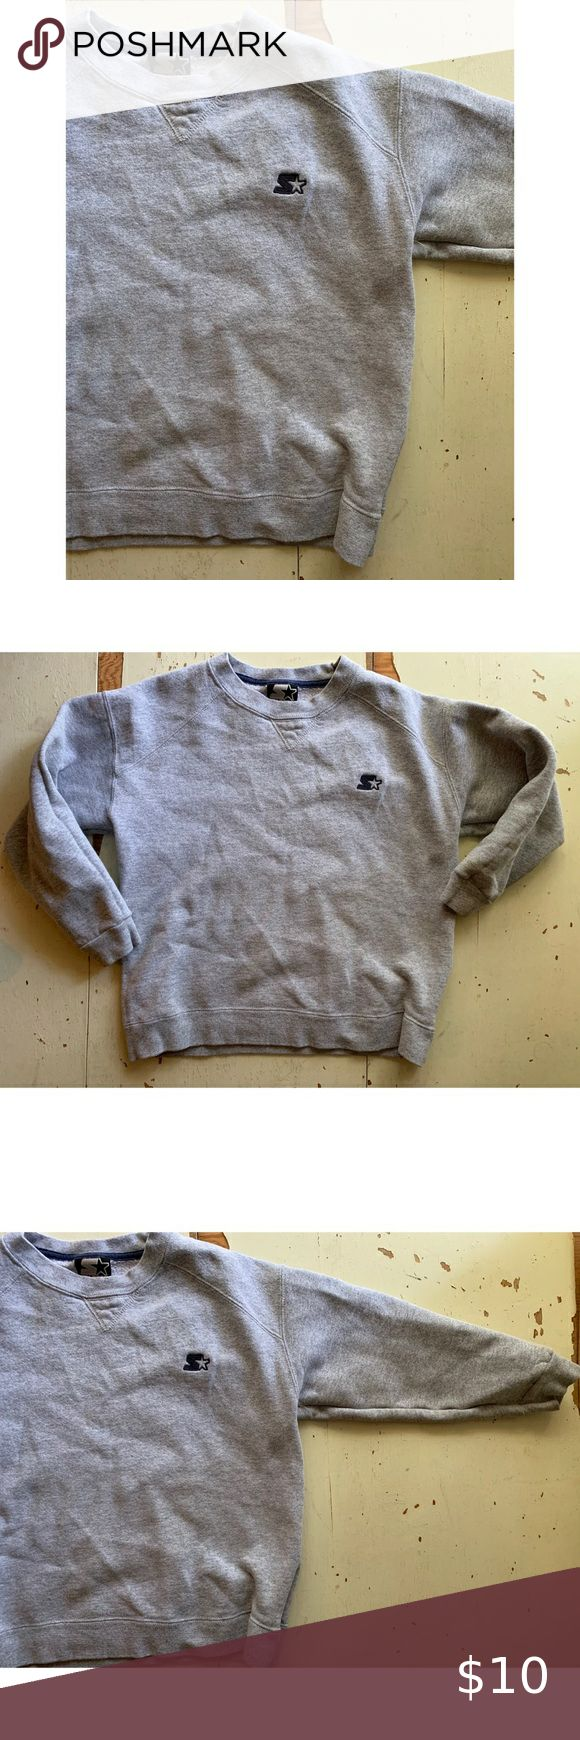 Starter Grey Crew Neck Sweatshirt Kid S Sweater From Starter Heavyweight Super Warm And Comfy Long Slee Crew Neck Sweatshirt Sweatshirts Comfy Long Sleeve [ 1740 x 580 Pixel ]